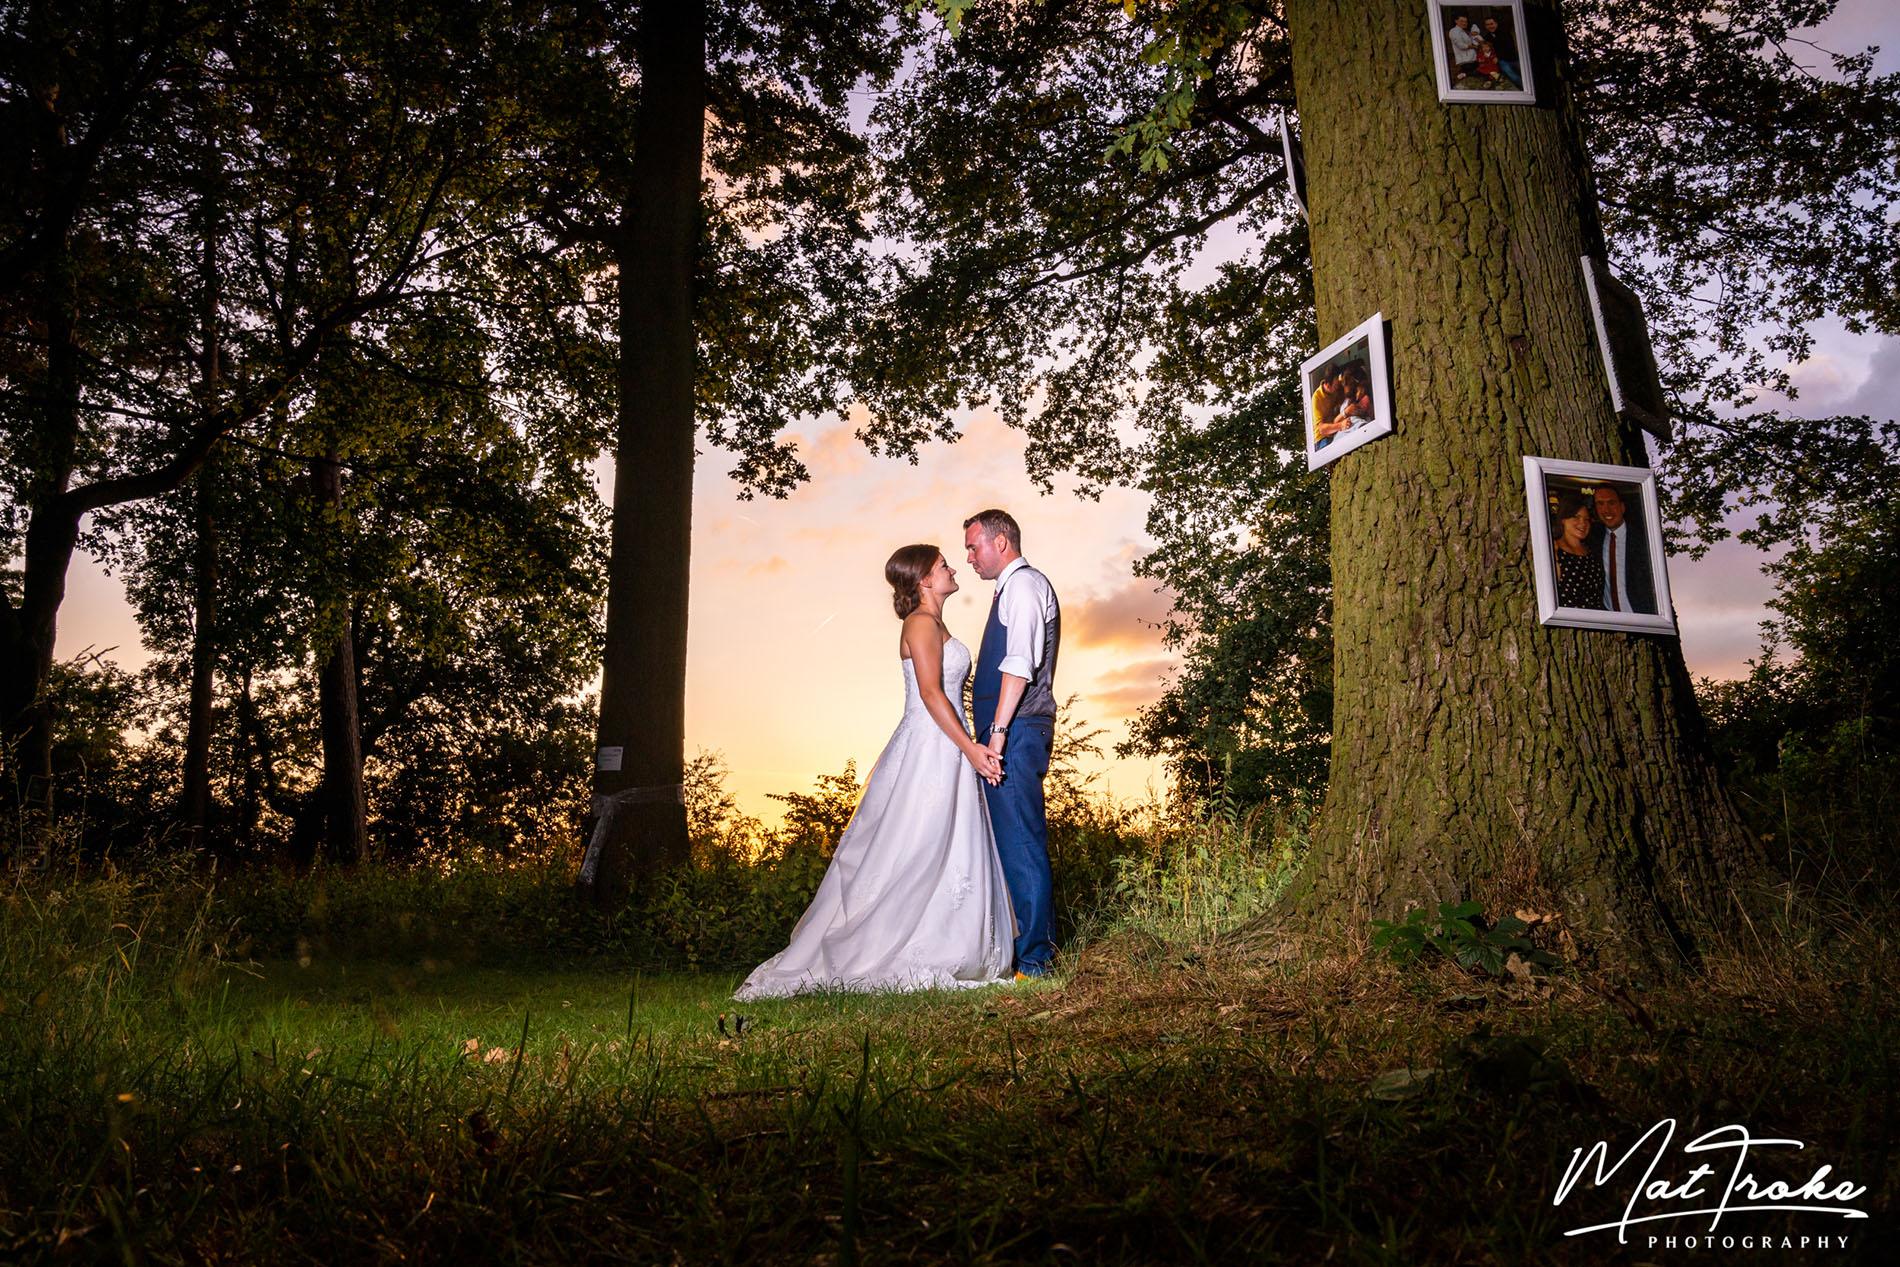 kelham_country_manor_groom_prep_wedding_photographer_photography_pergoda_night_bride_groom_photography